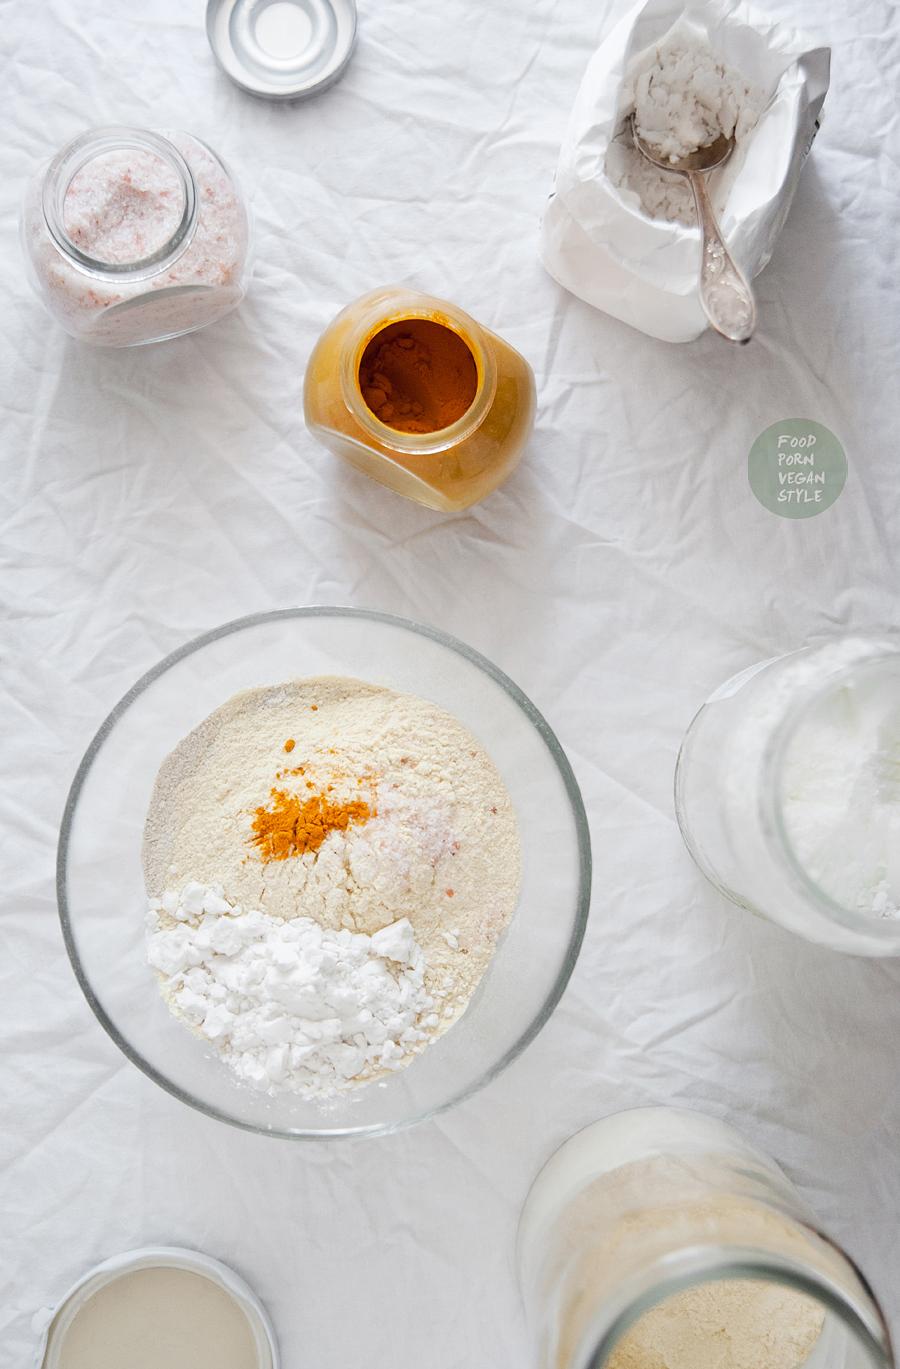 Vegan gluten-free pie crust (sweet and savory version)